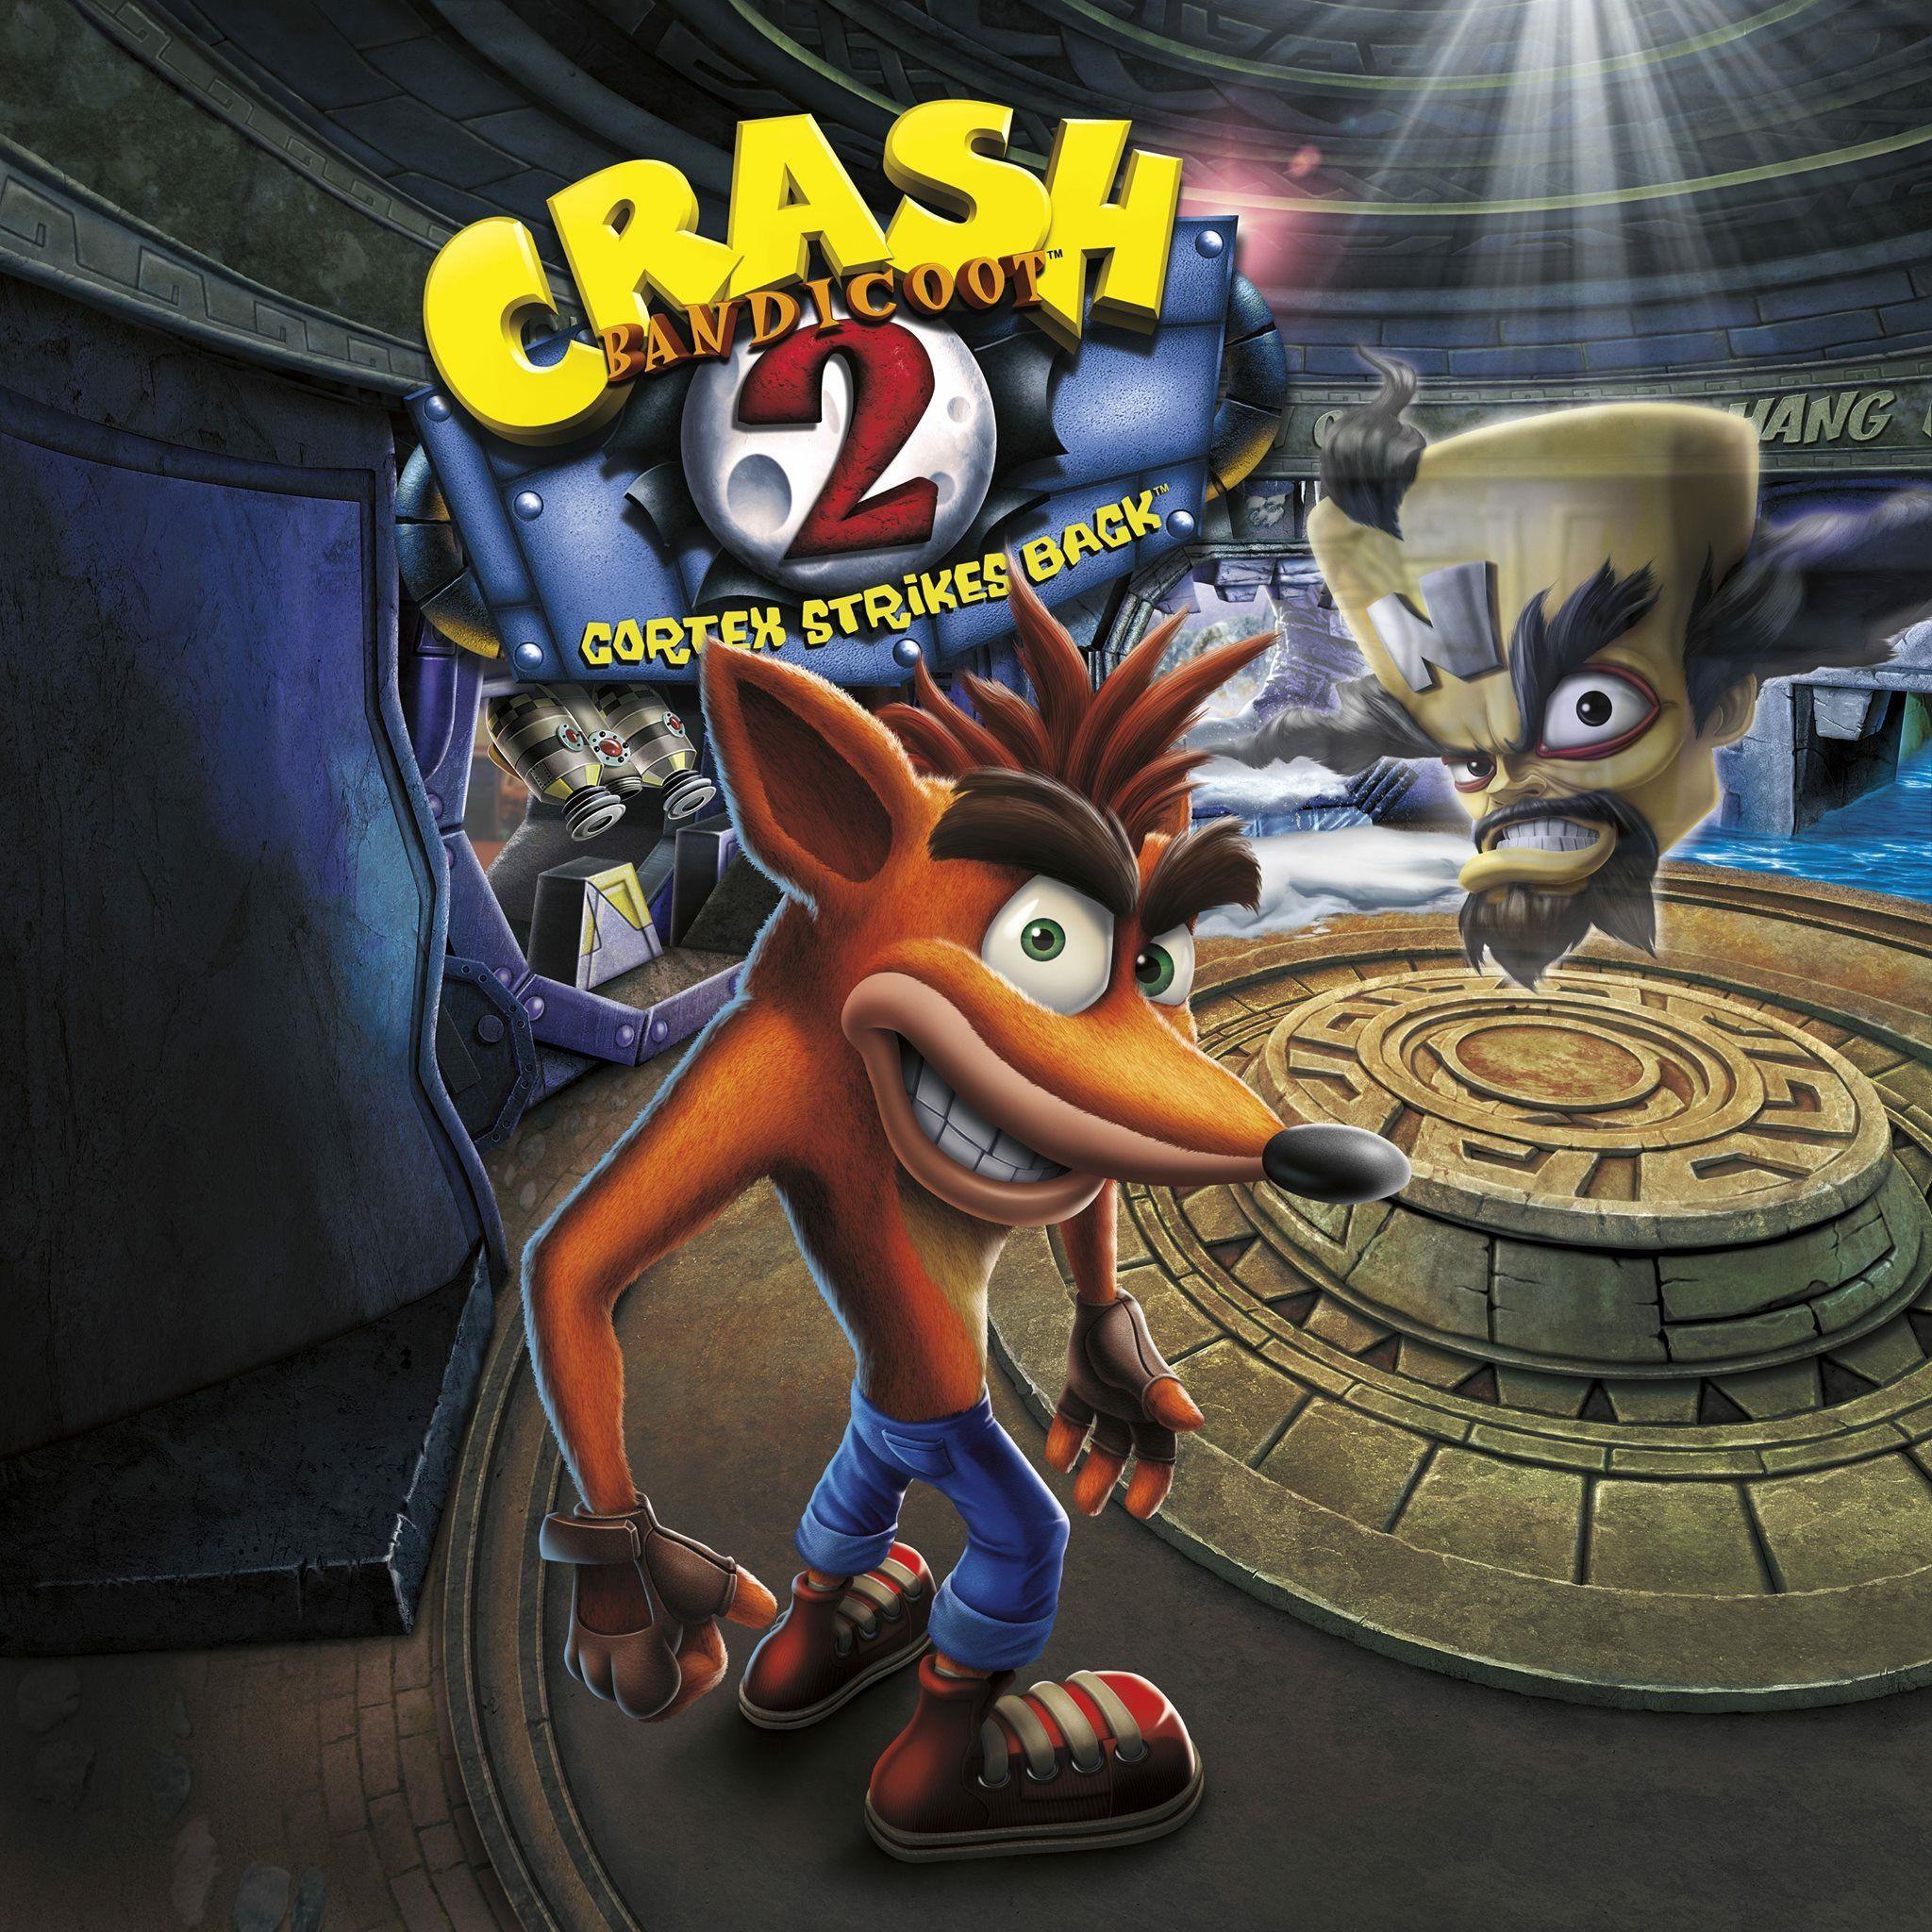 Crash Bandicoot 2: The Wrath of Cortex | Gaming | Crash